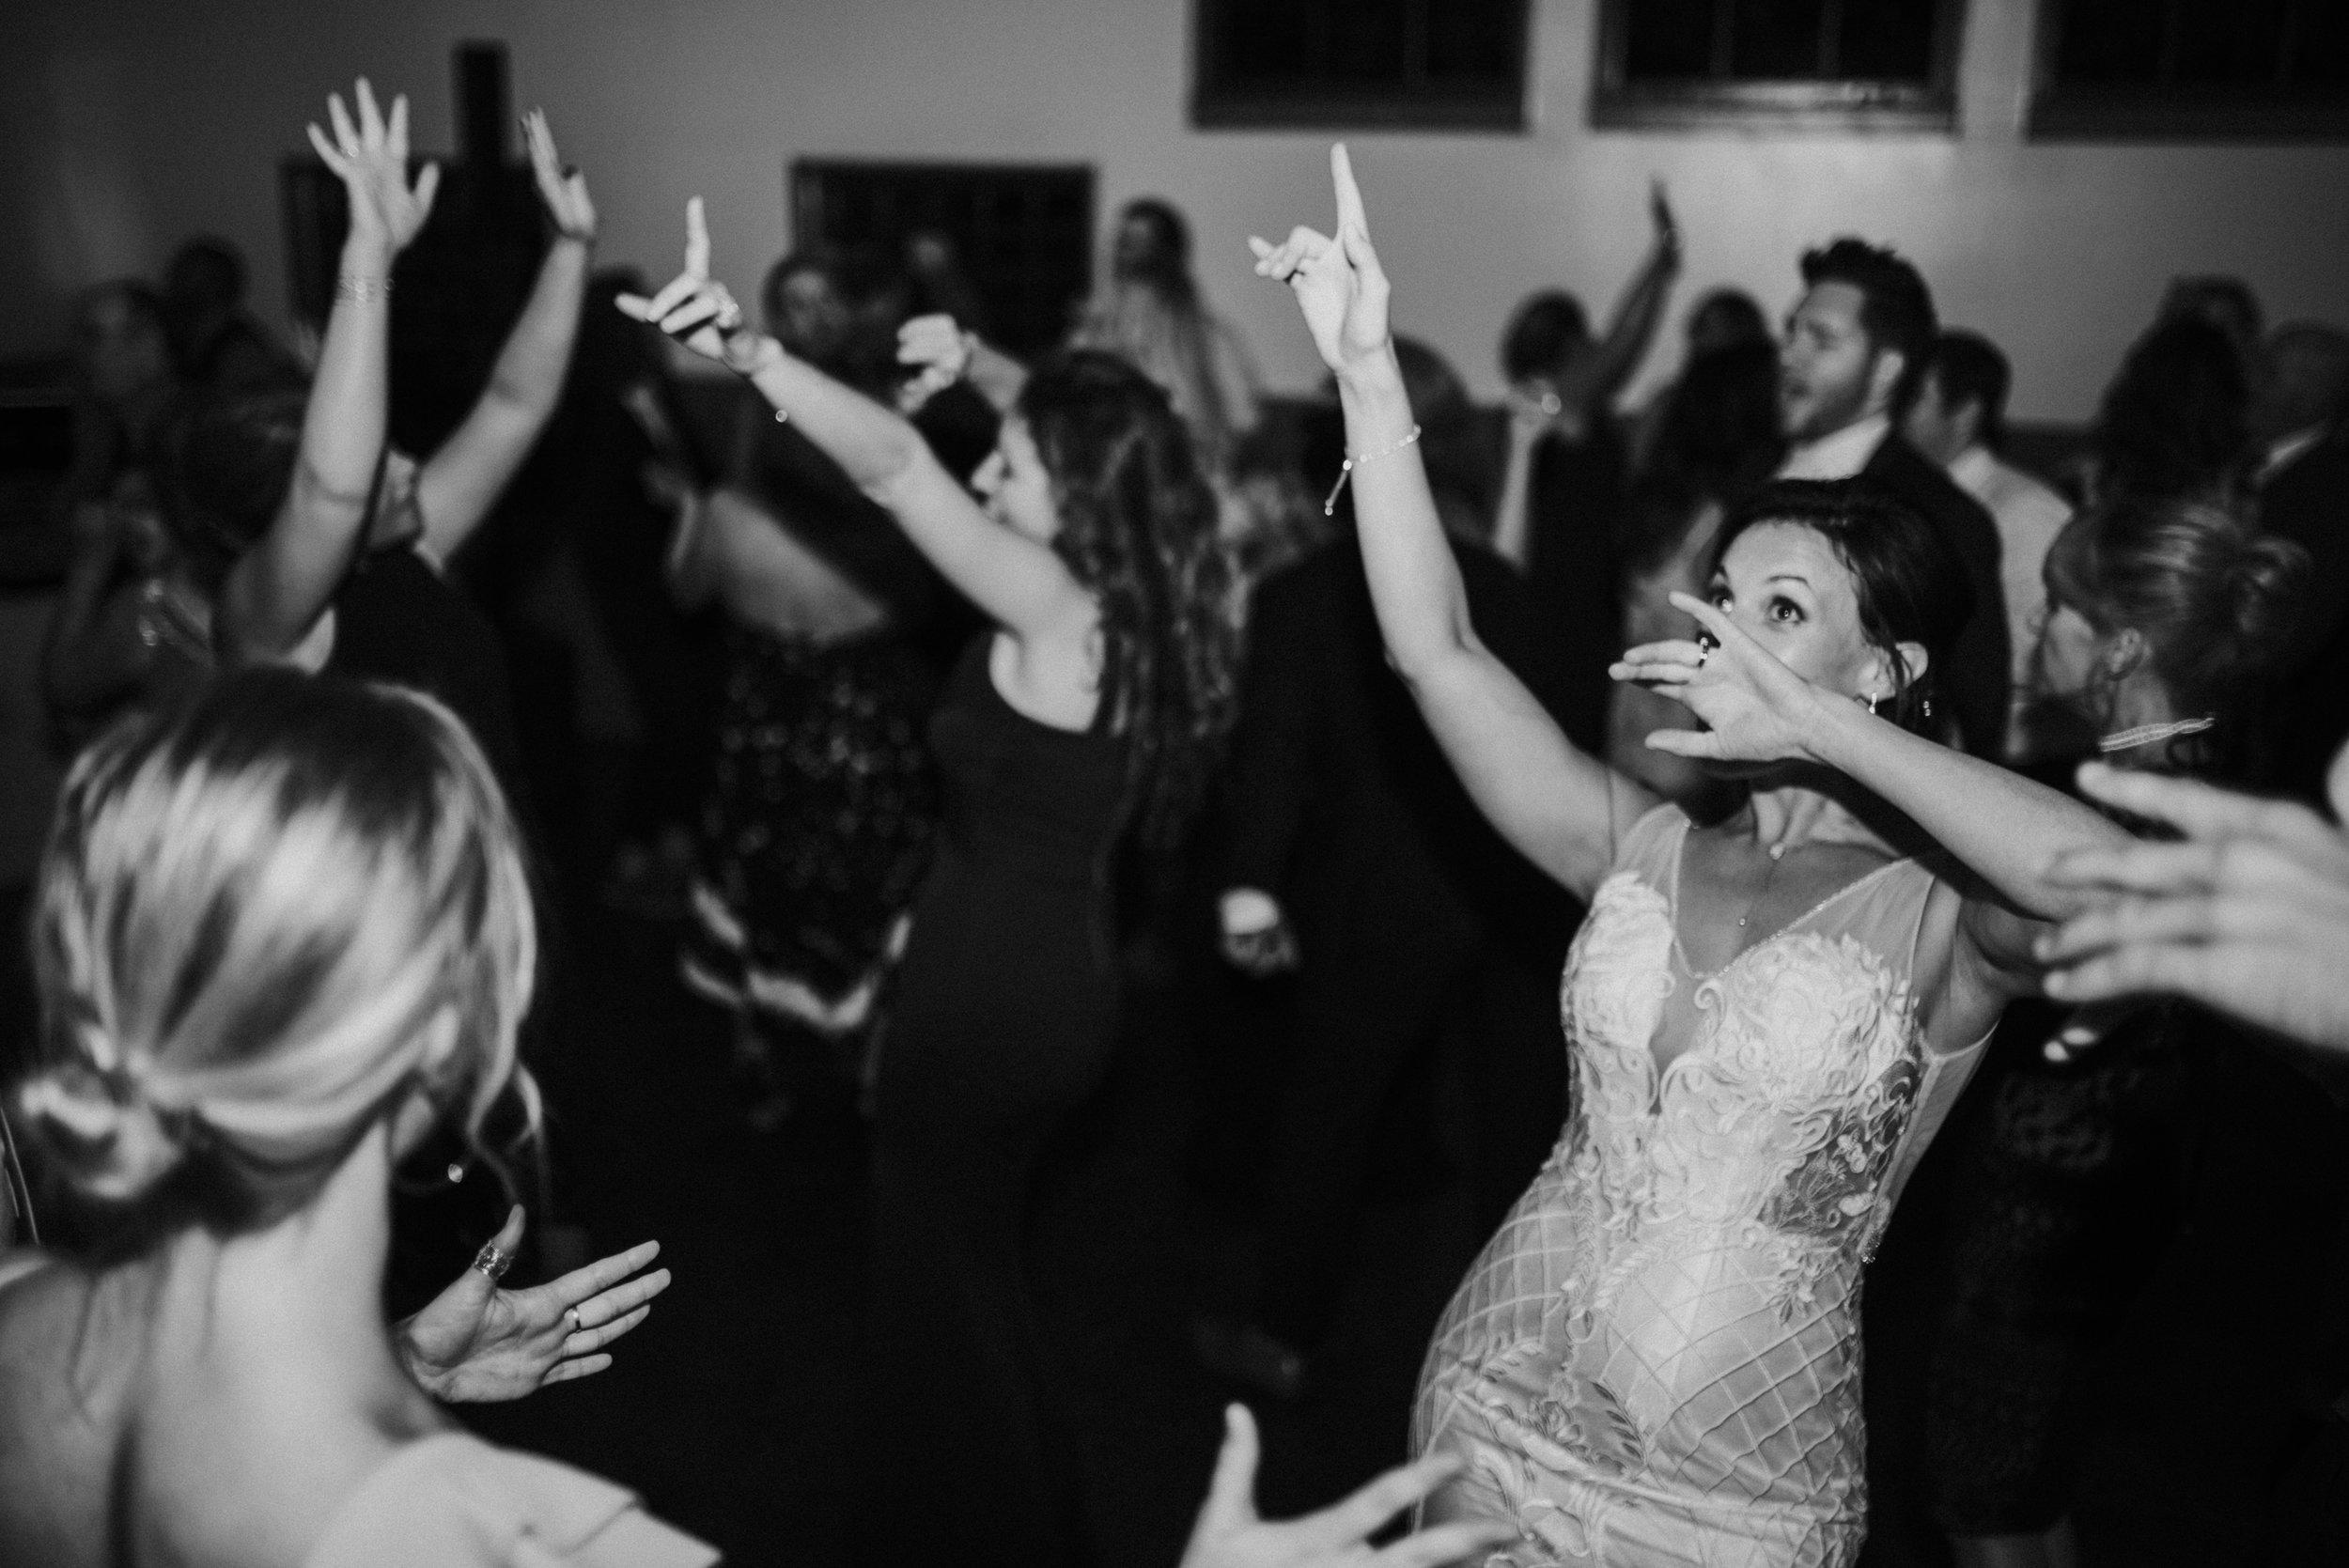 People dancing at wedding reception